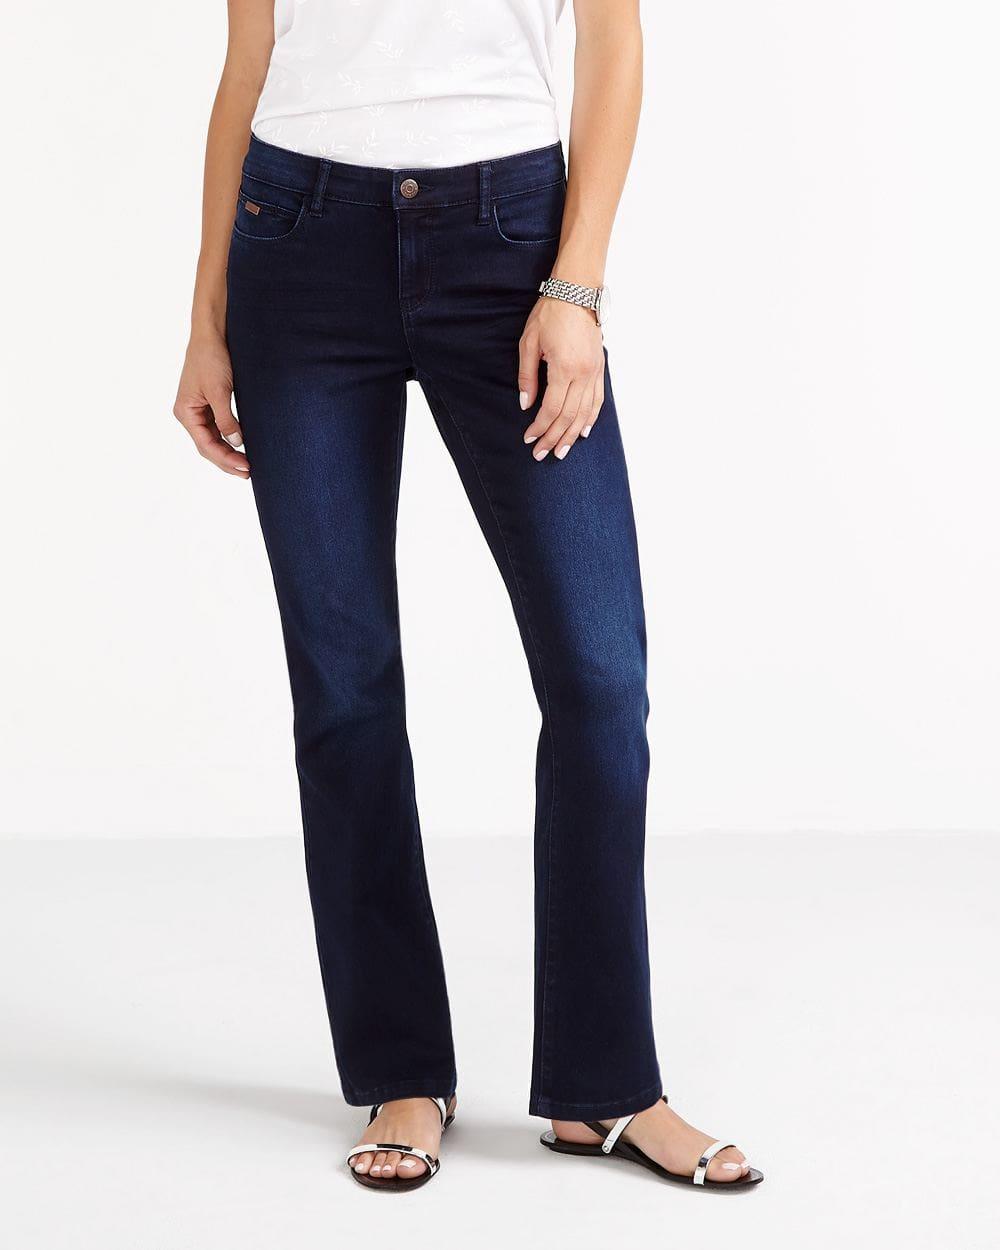 The Petite Signature Soft Boot Cut Jeans